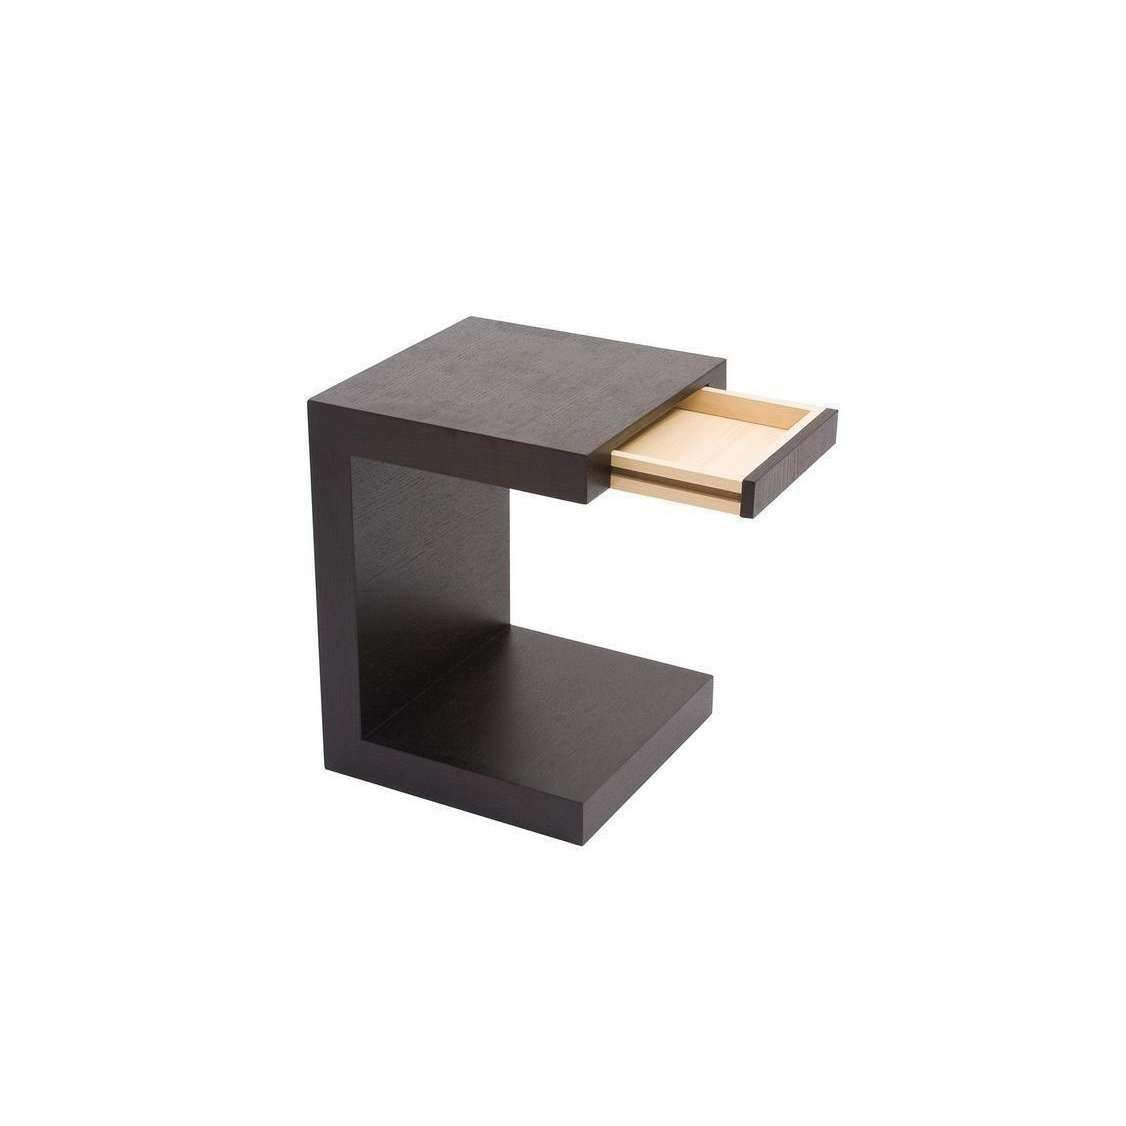 Zio Sidetable Black Oak In 2020 Black Side Table Moe S Home Collection Modern Side Table